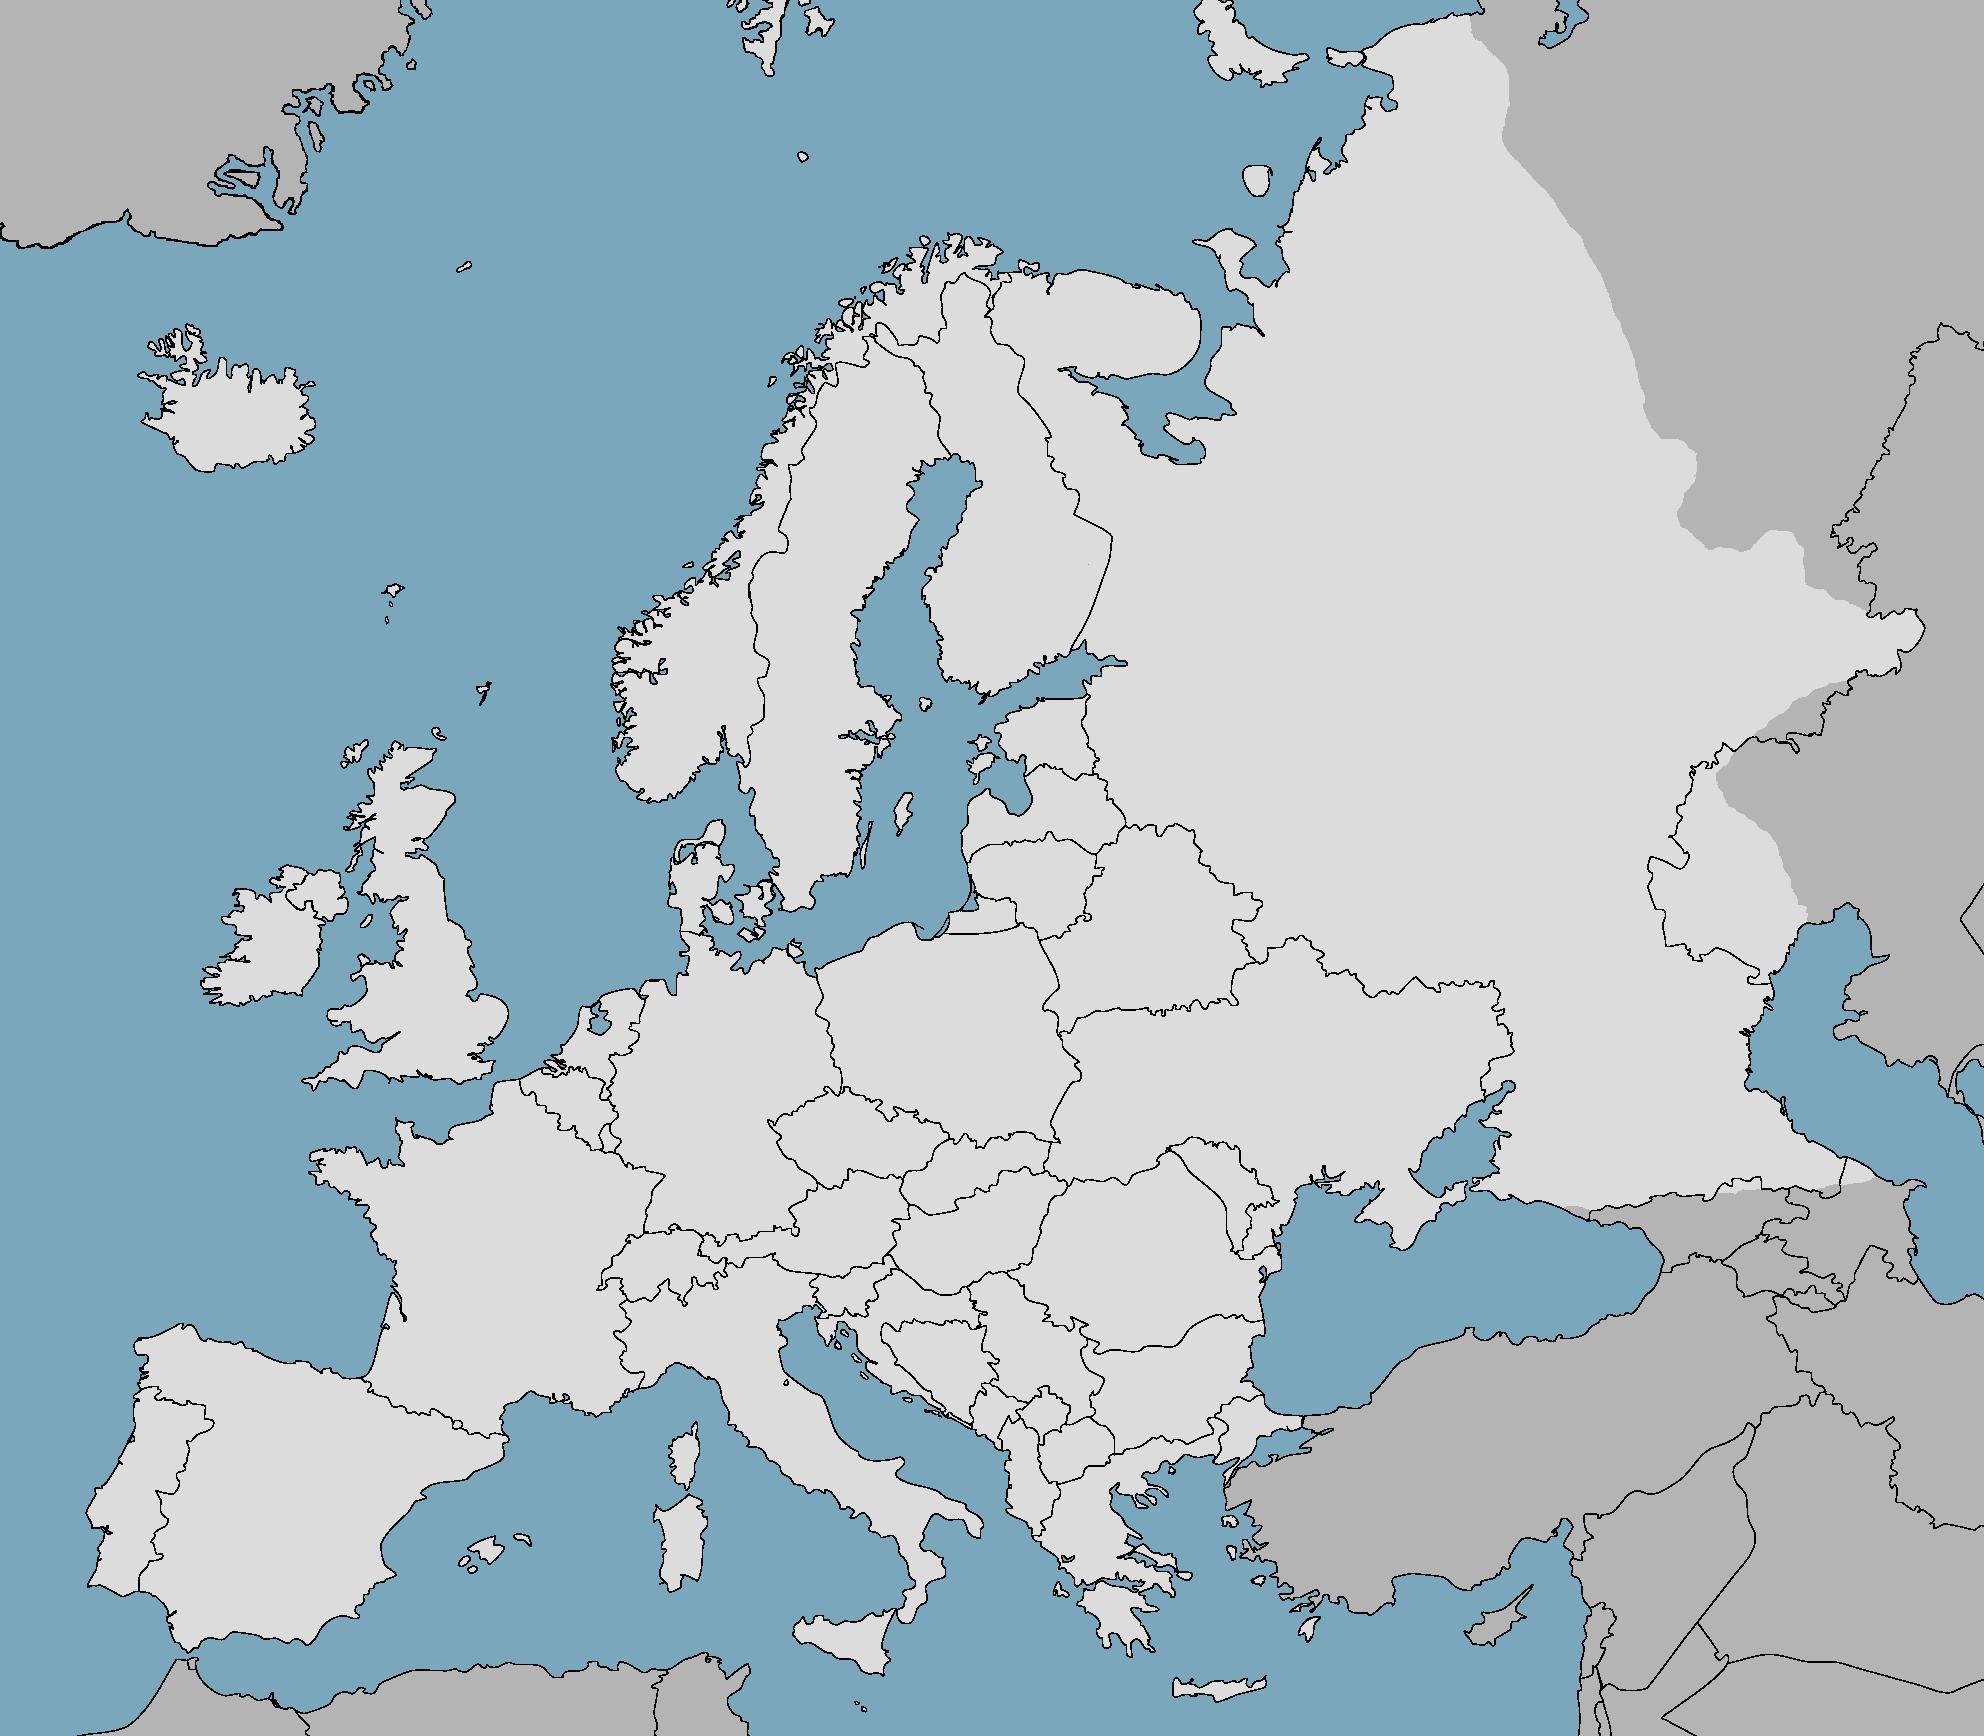 Blank Europe Blue Sea Map Europe Good Things